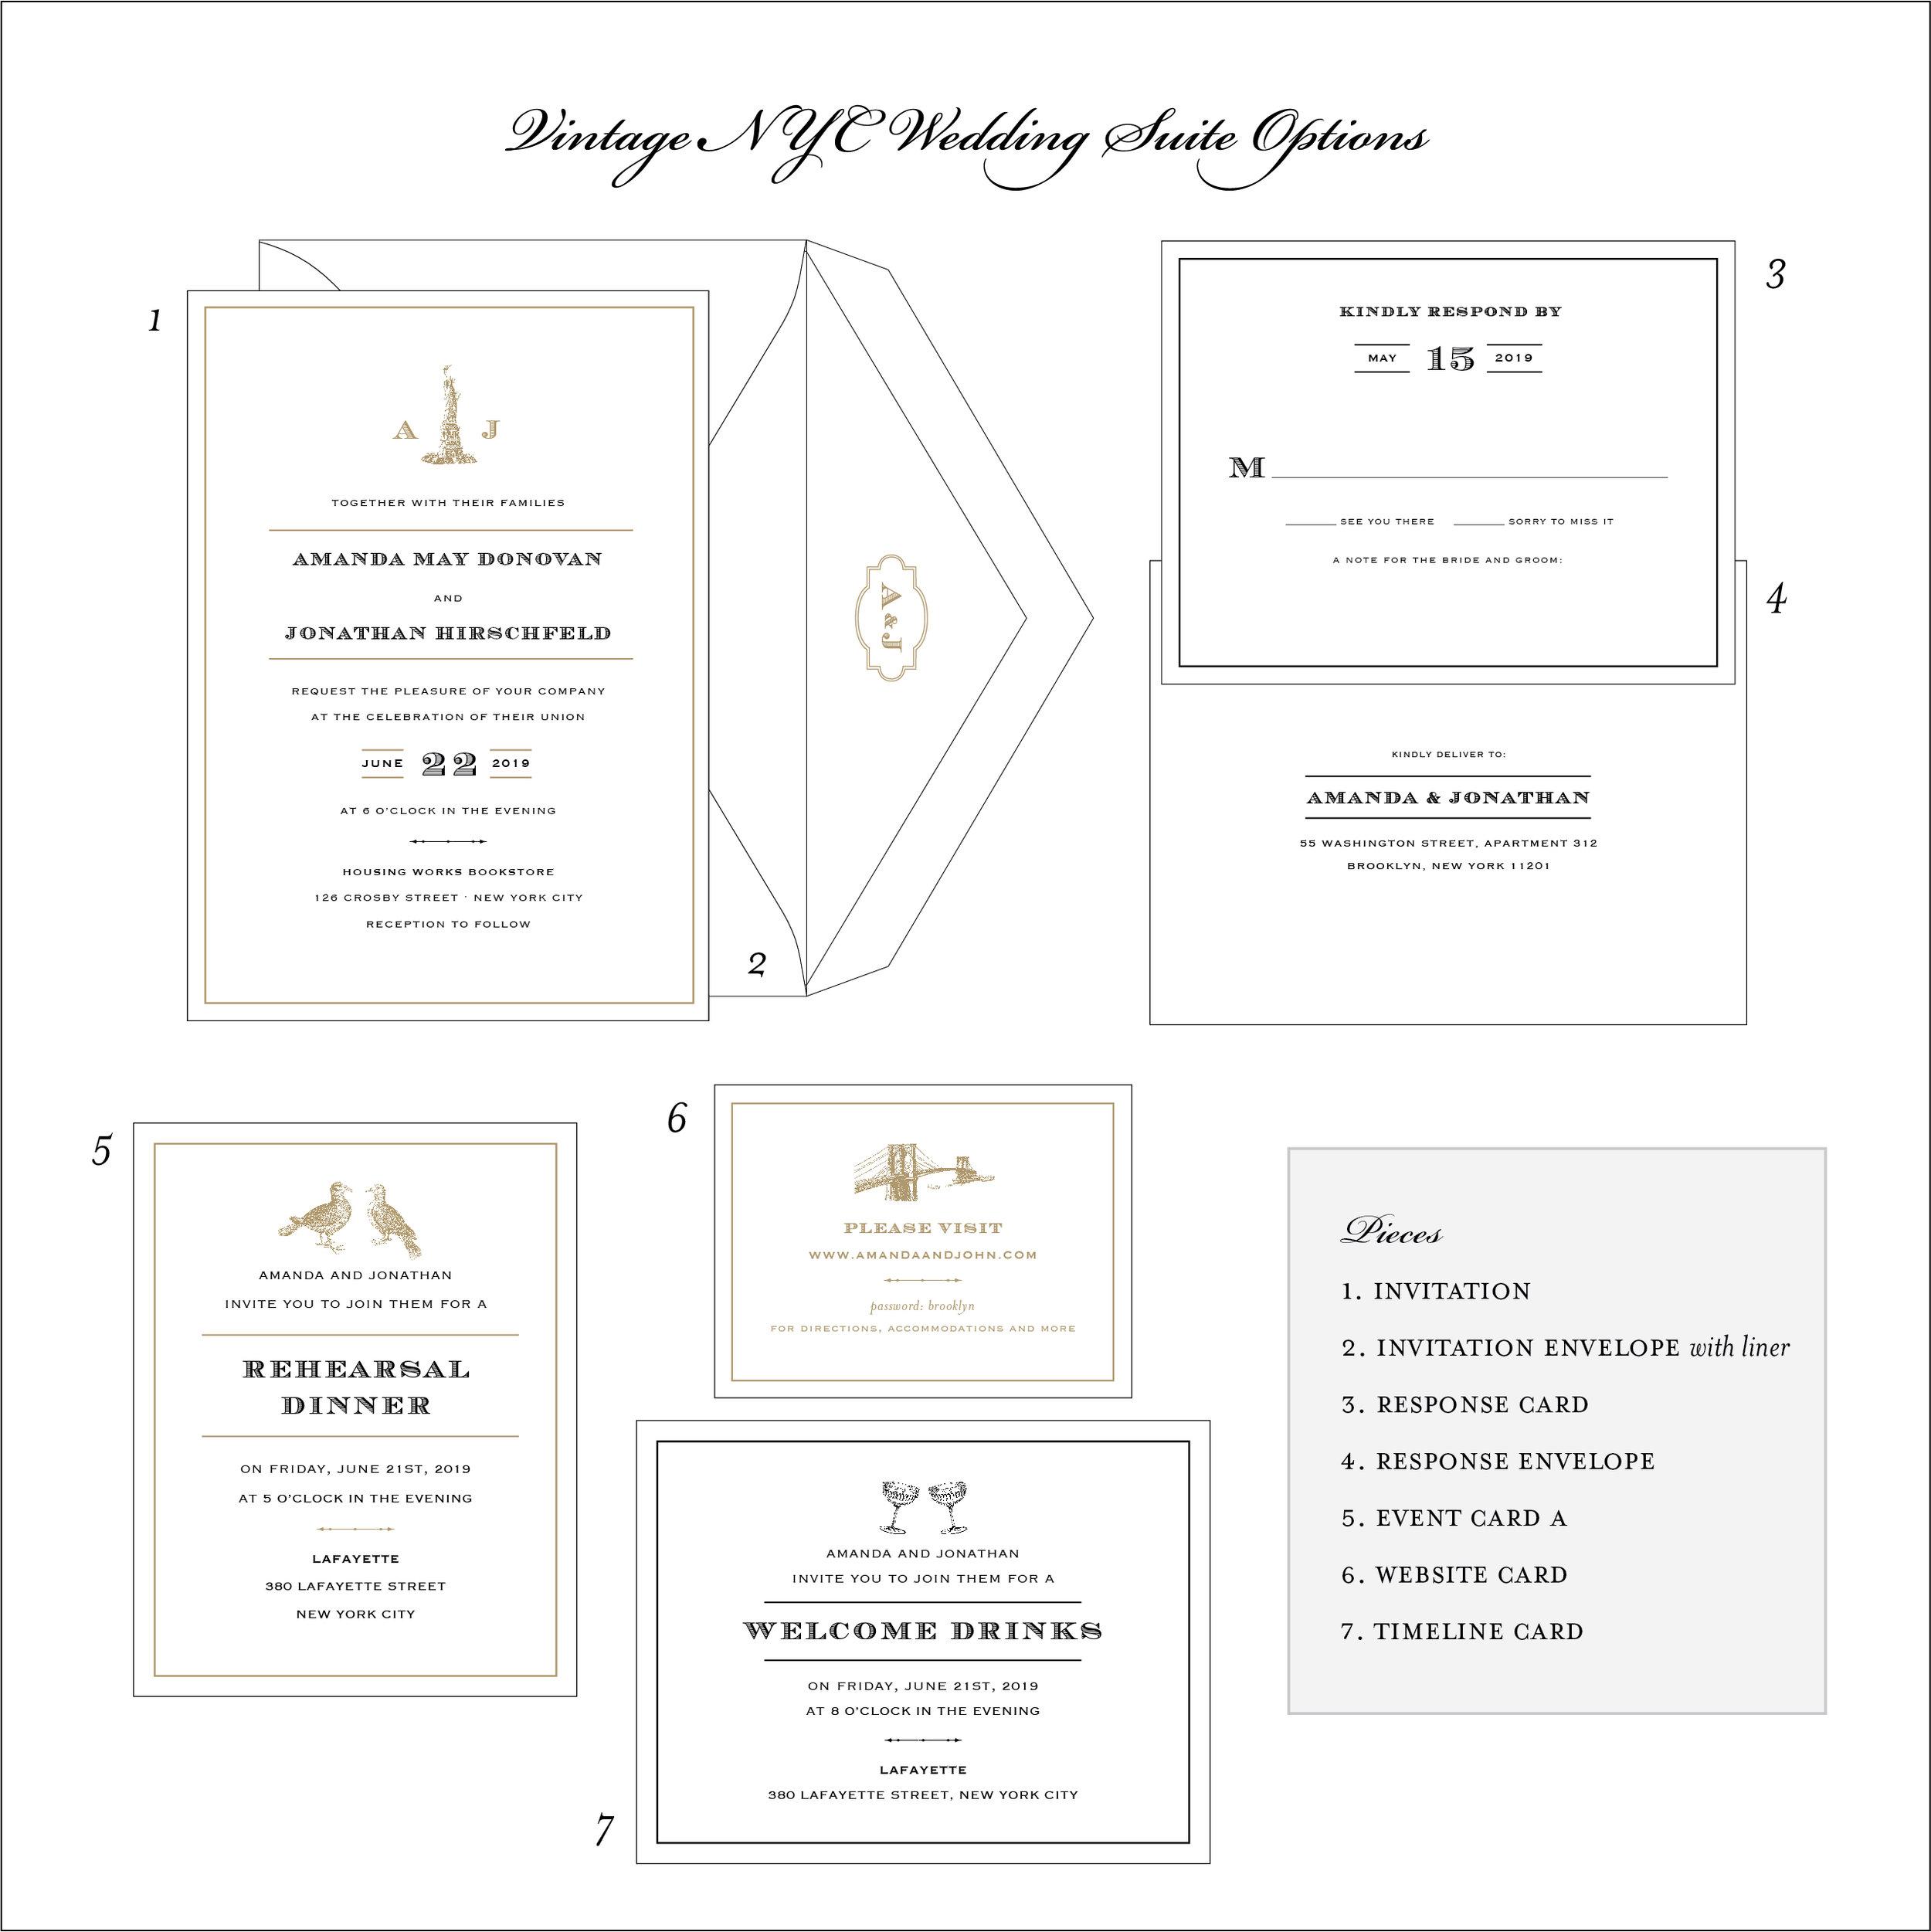 Website_Invite_Options-VINTAGE-NYC-A.jpg